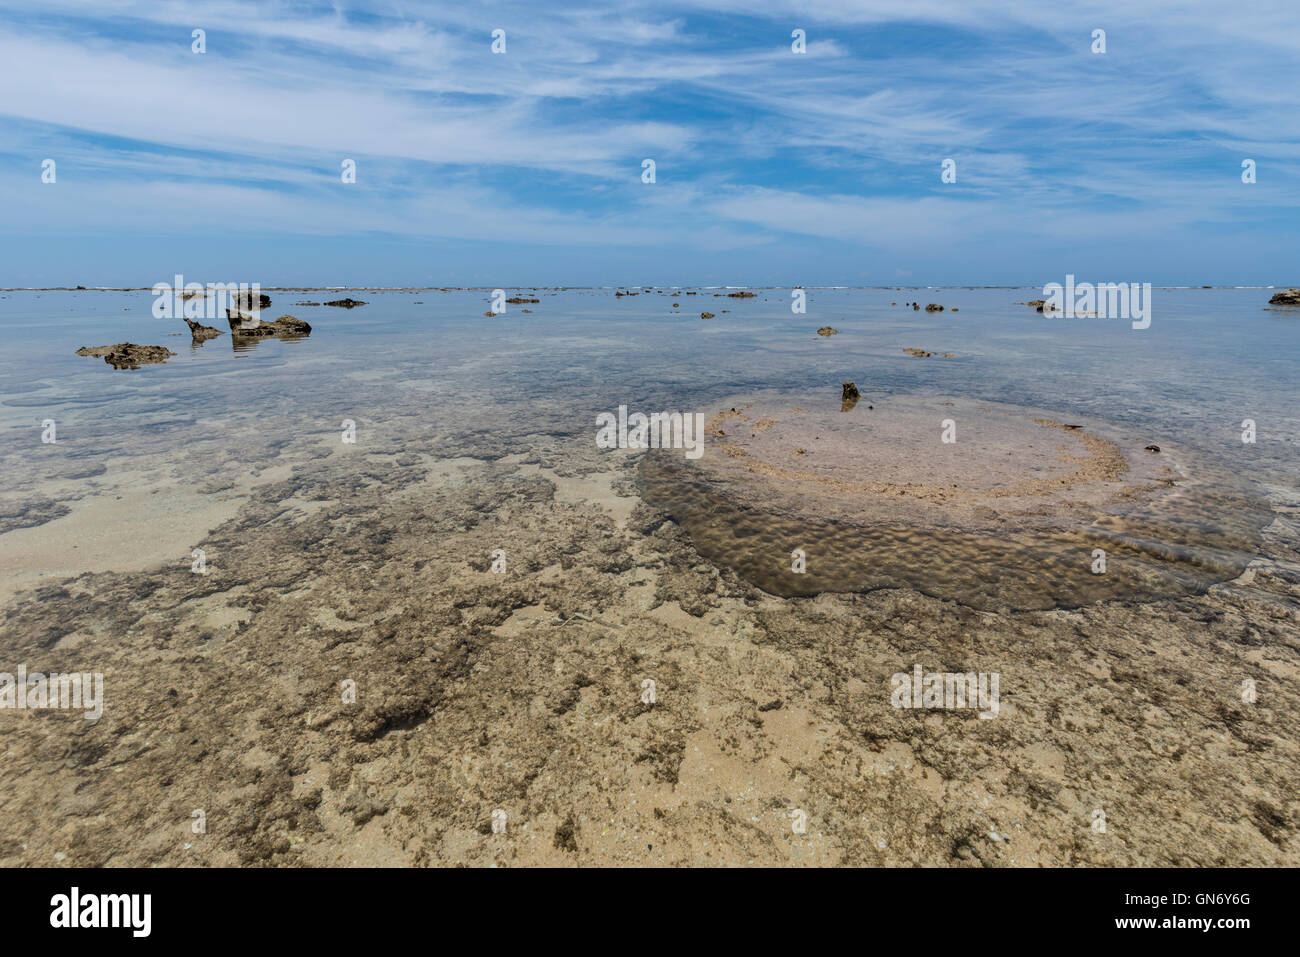 Sea of Hatoma, Okinawa, Japan - Stock Image